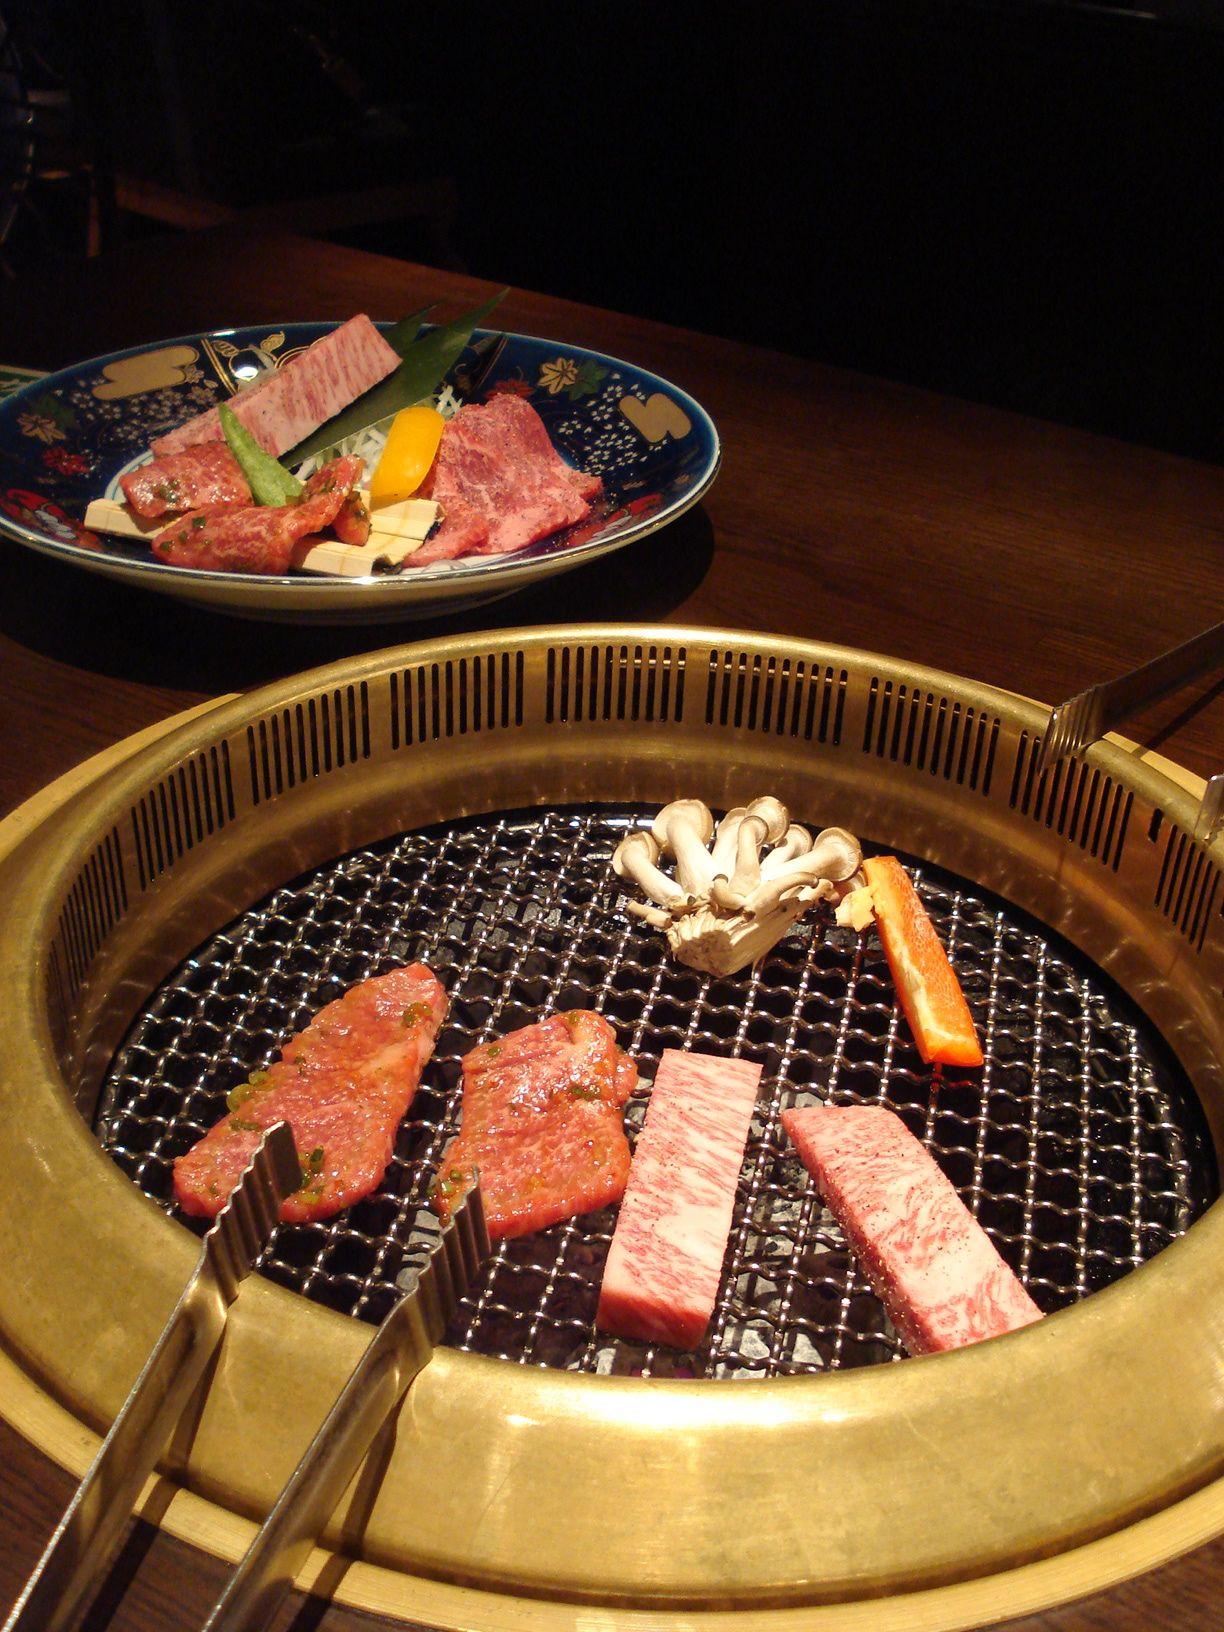 yakiniku order cuts of meat and veggies cook yourself over coal or